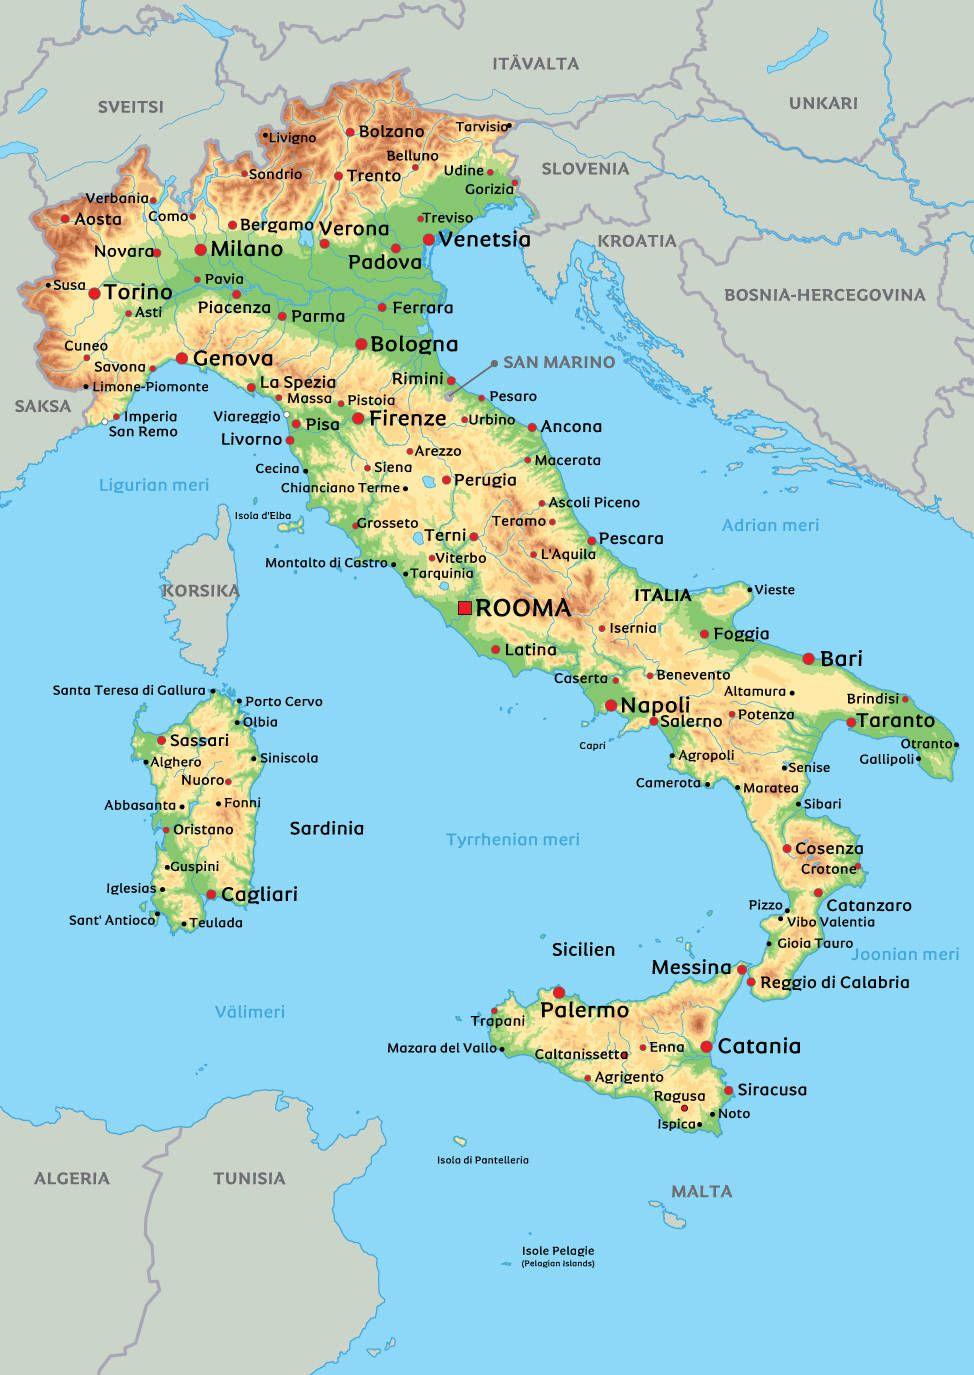 Kartta Italiasta: kts. esim. kaupunkien sijainti kartasta